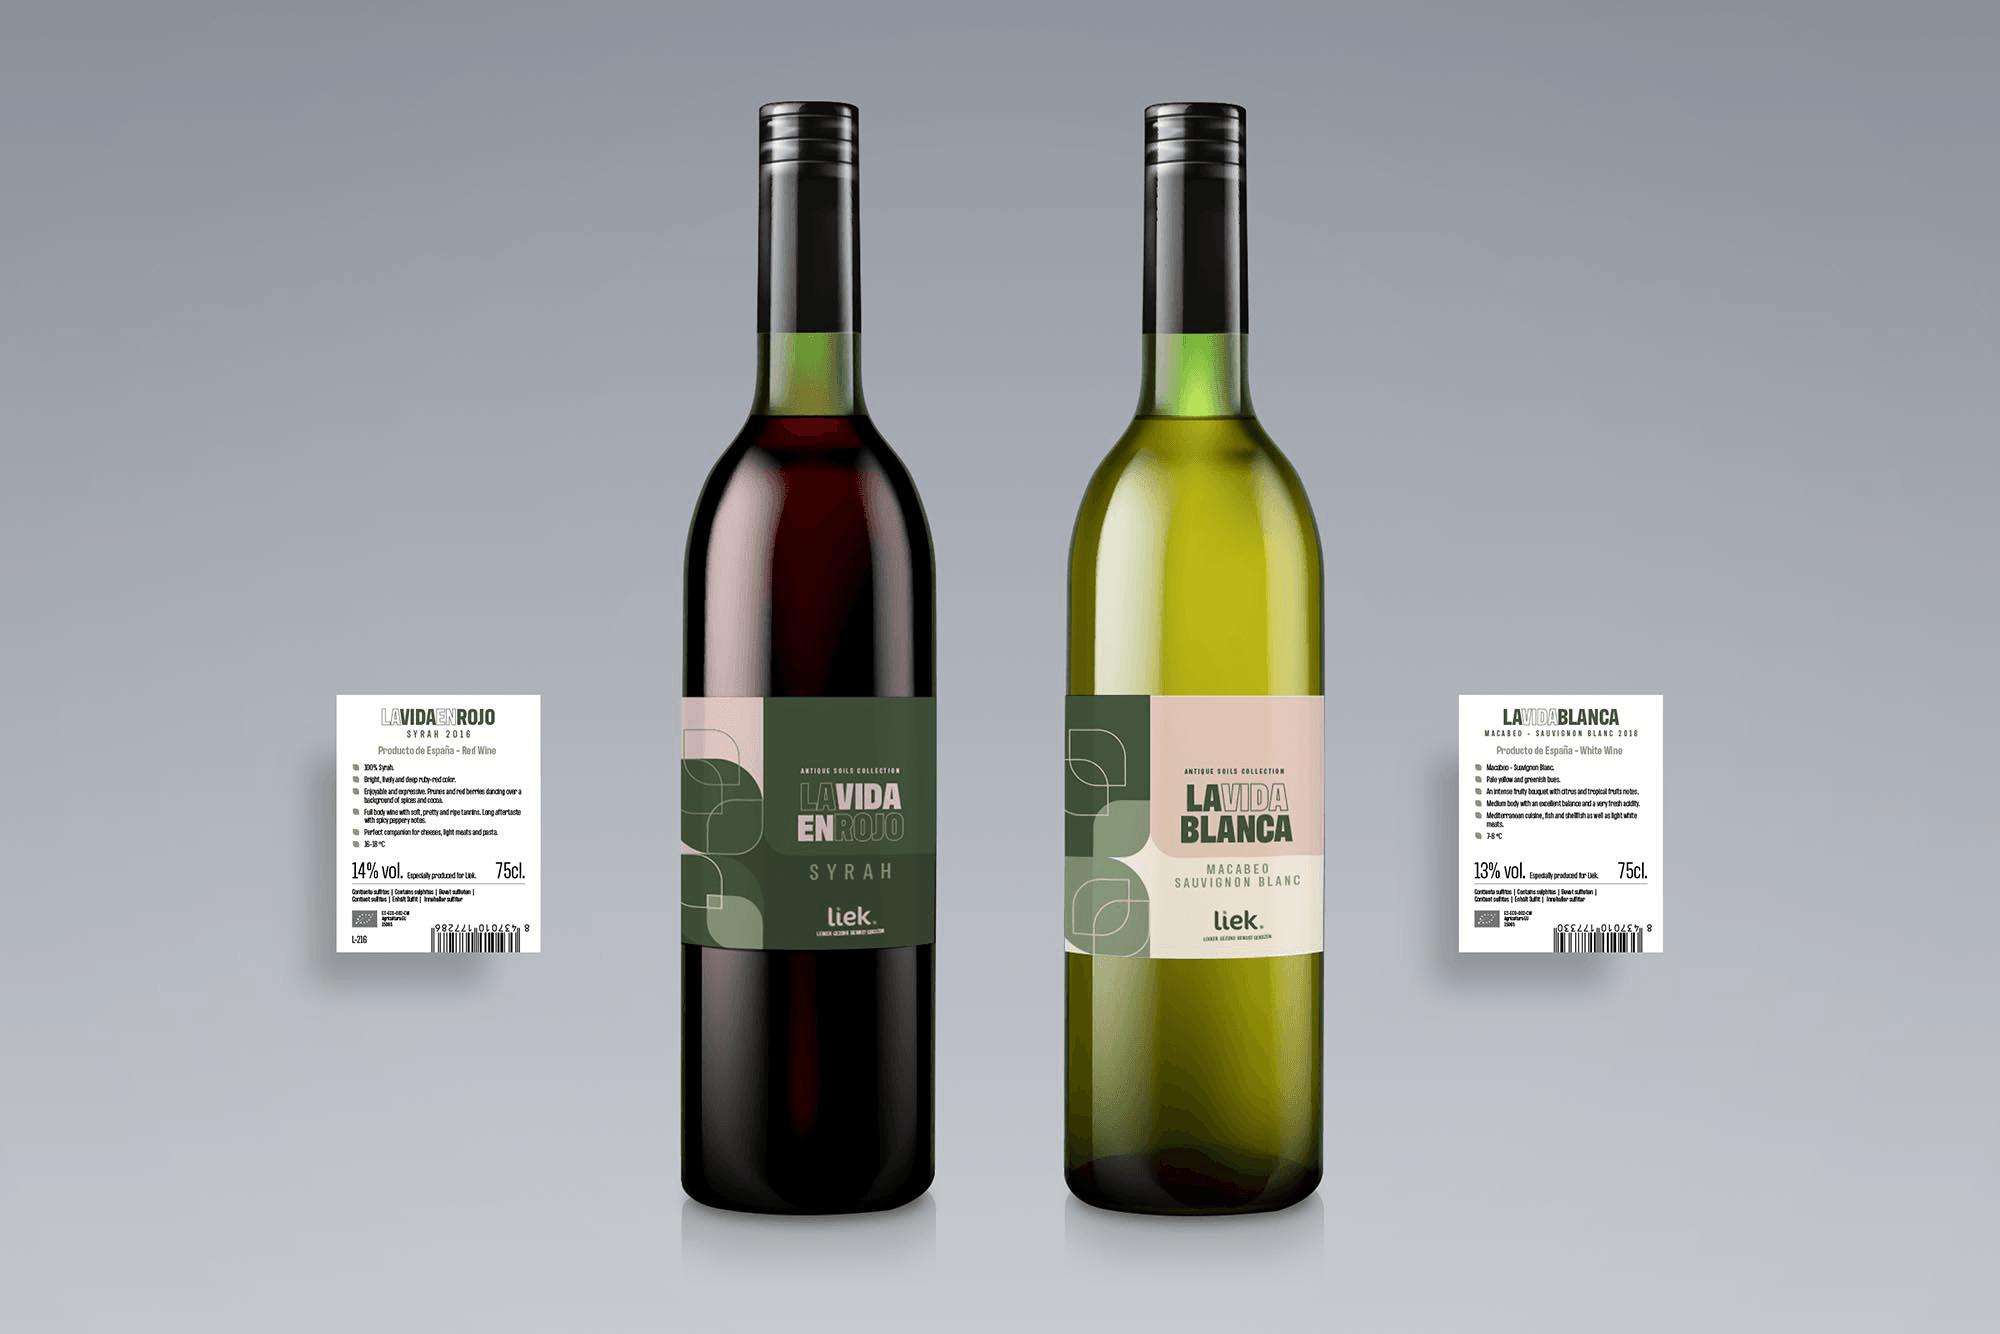 Etiketten wijnflessen Liek